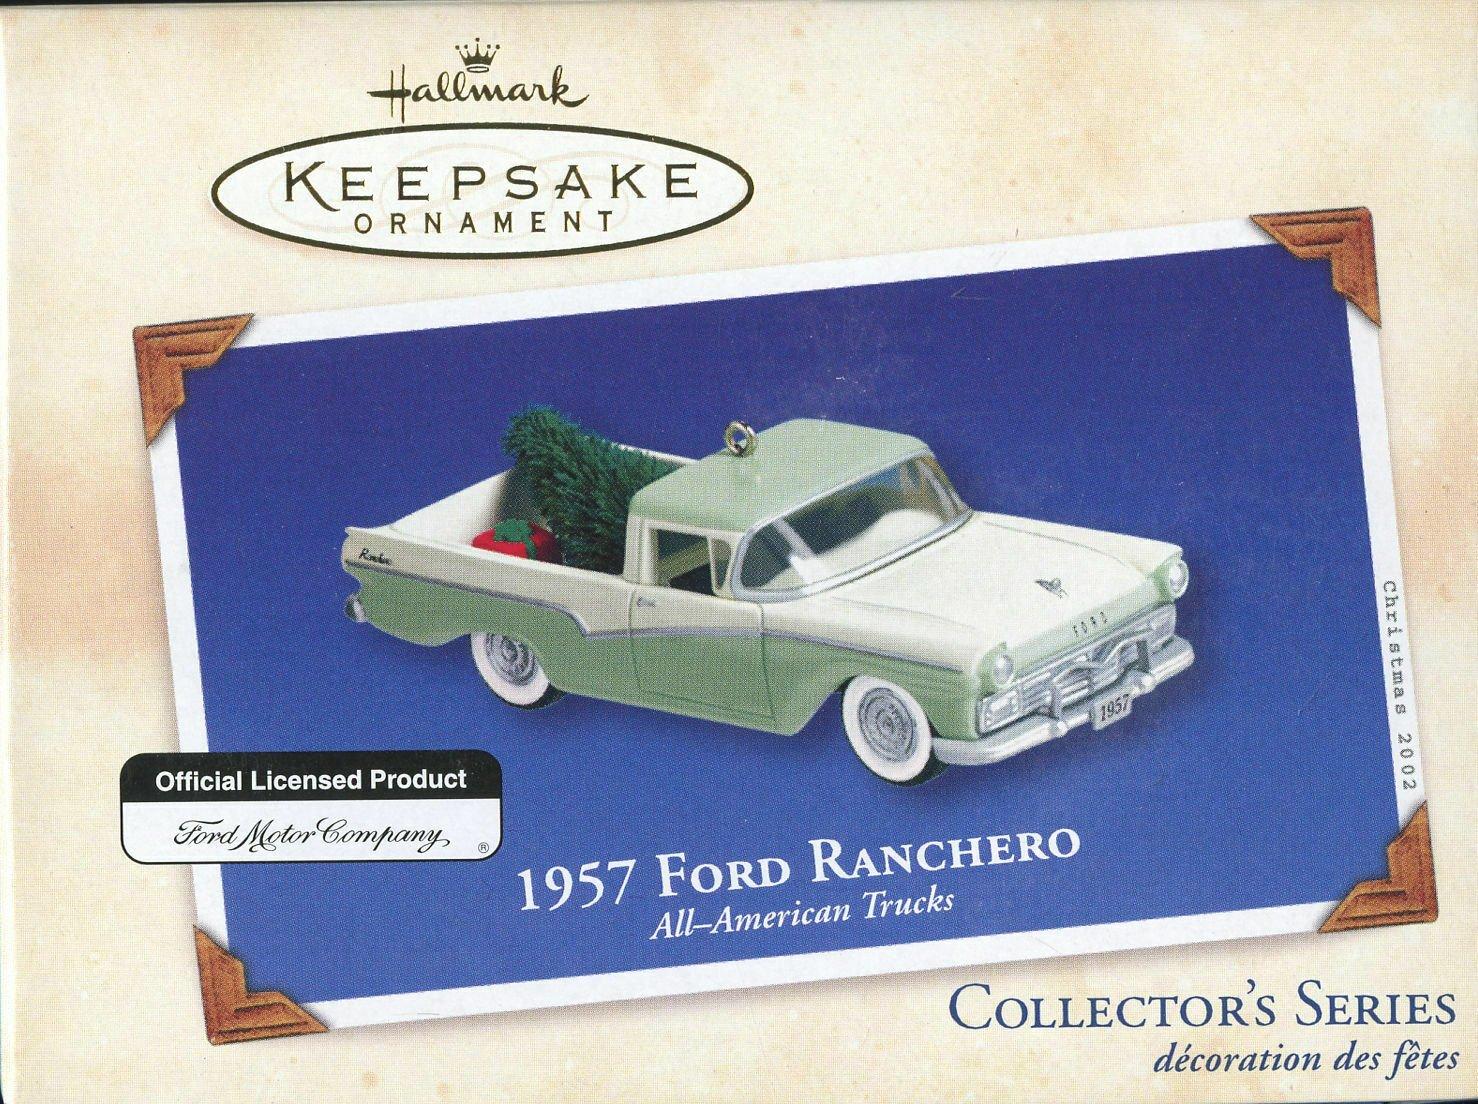 2002 Hallmark Ornament 1957 Ford Ranchero - All American Trucks Series #8